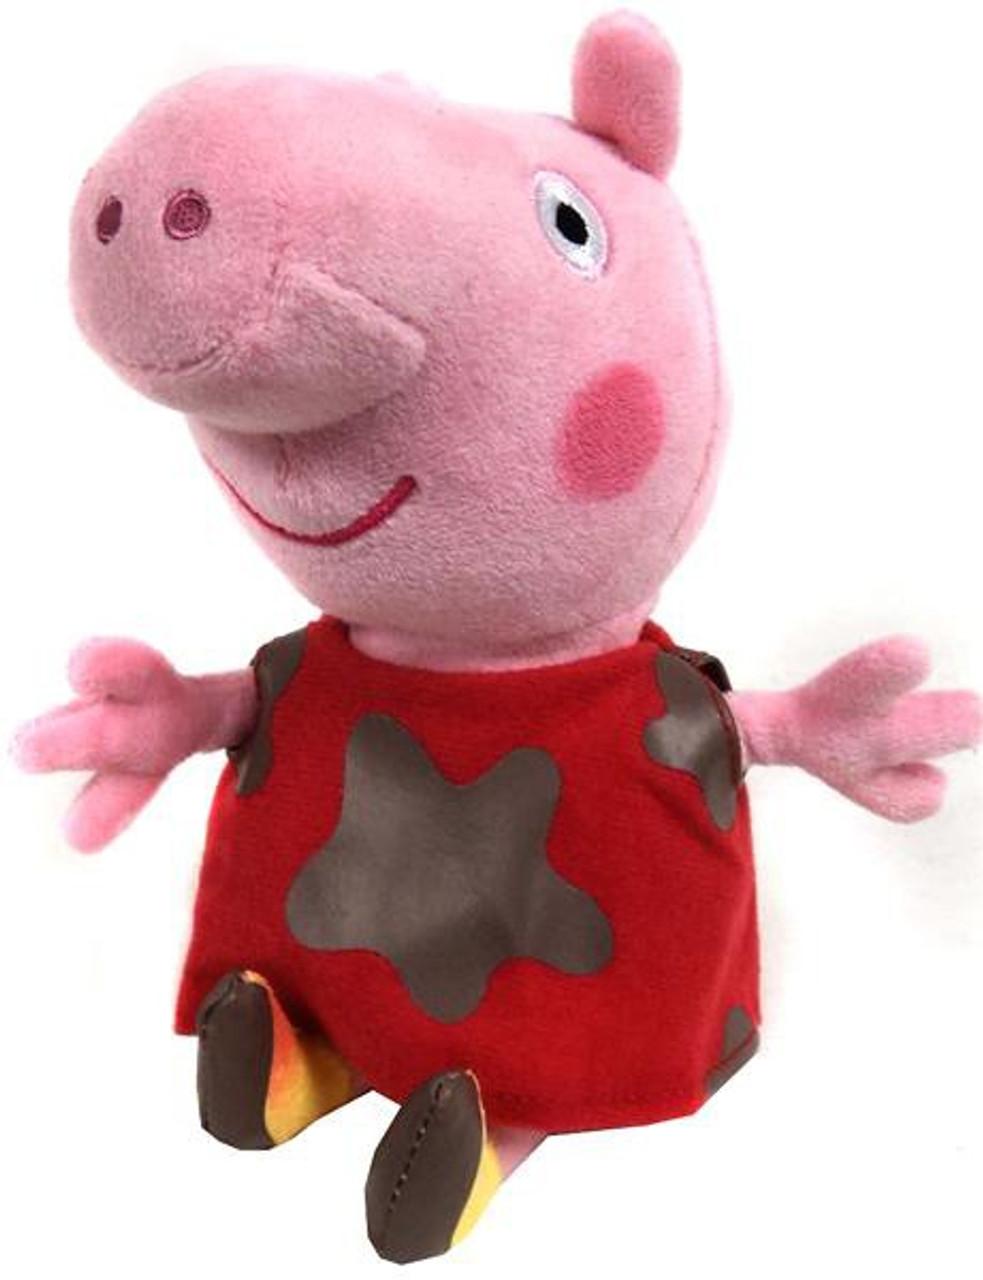 215512e826b Beanie Babies Peppa Pig Muddy Baby Peppa Exclusive Beanie Plush Ty - ToyWiz